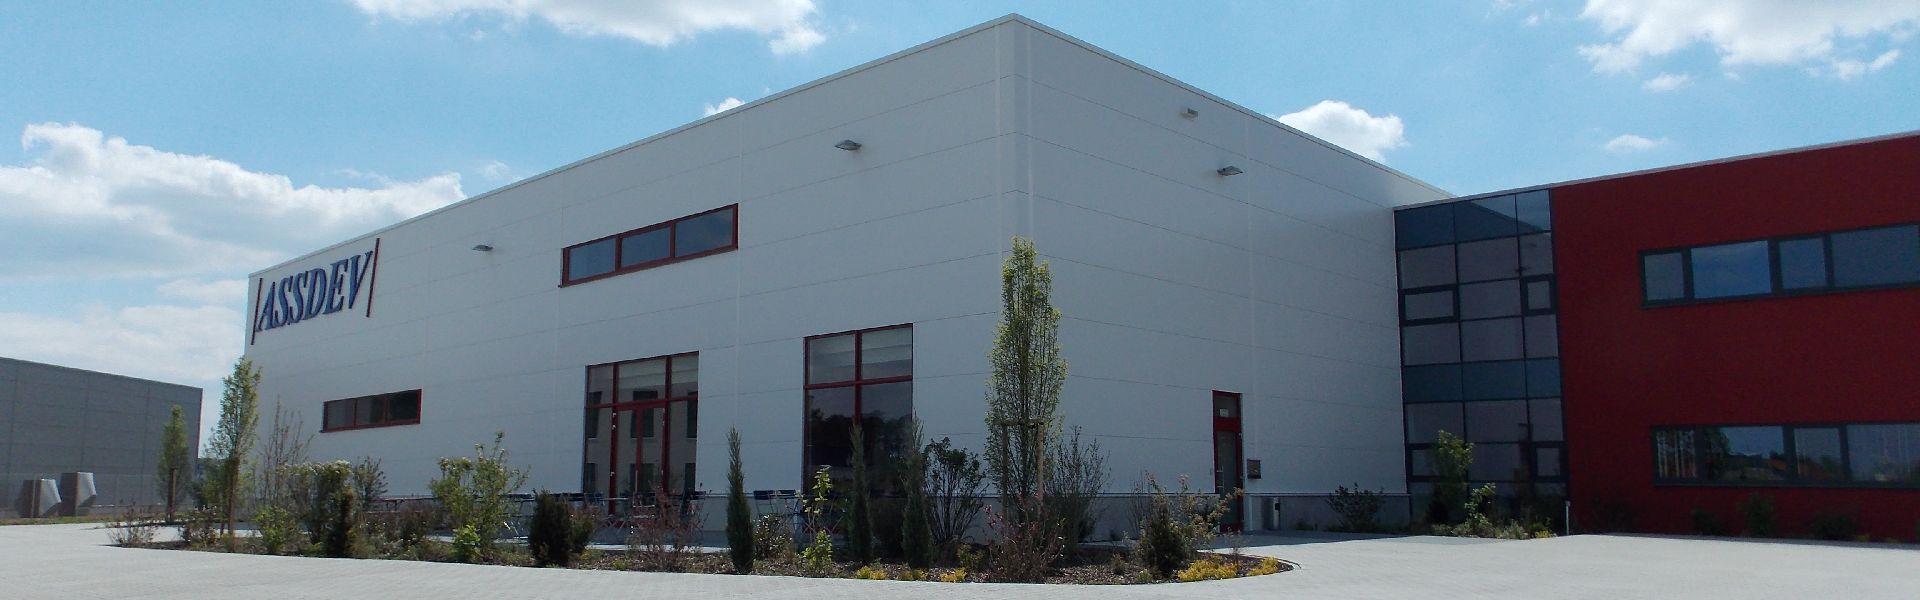 Assdev GmbH